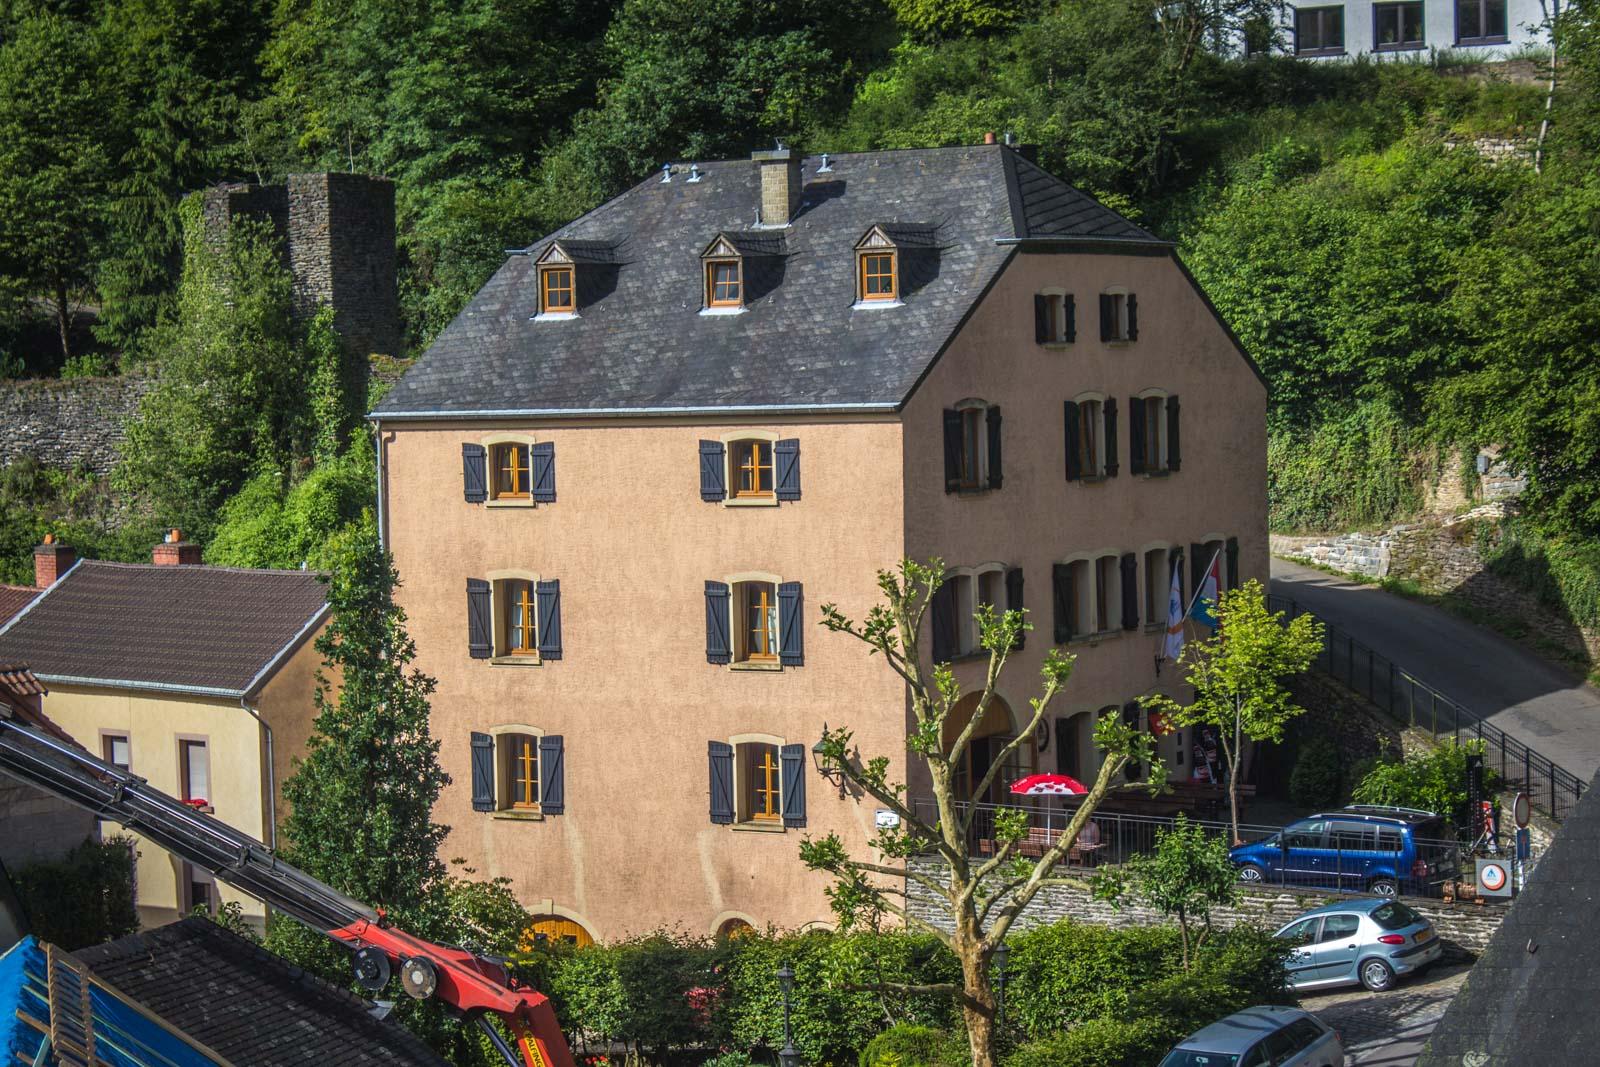 Luxembourg hostels, accommodation, viandan, bourglinster, echternach